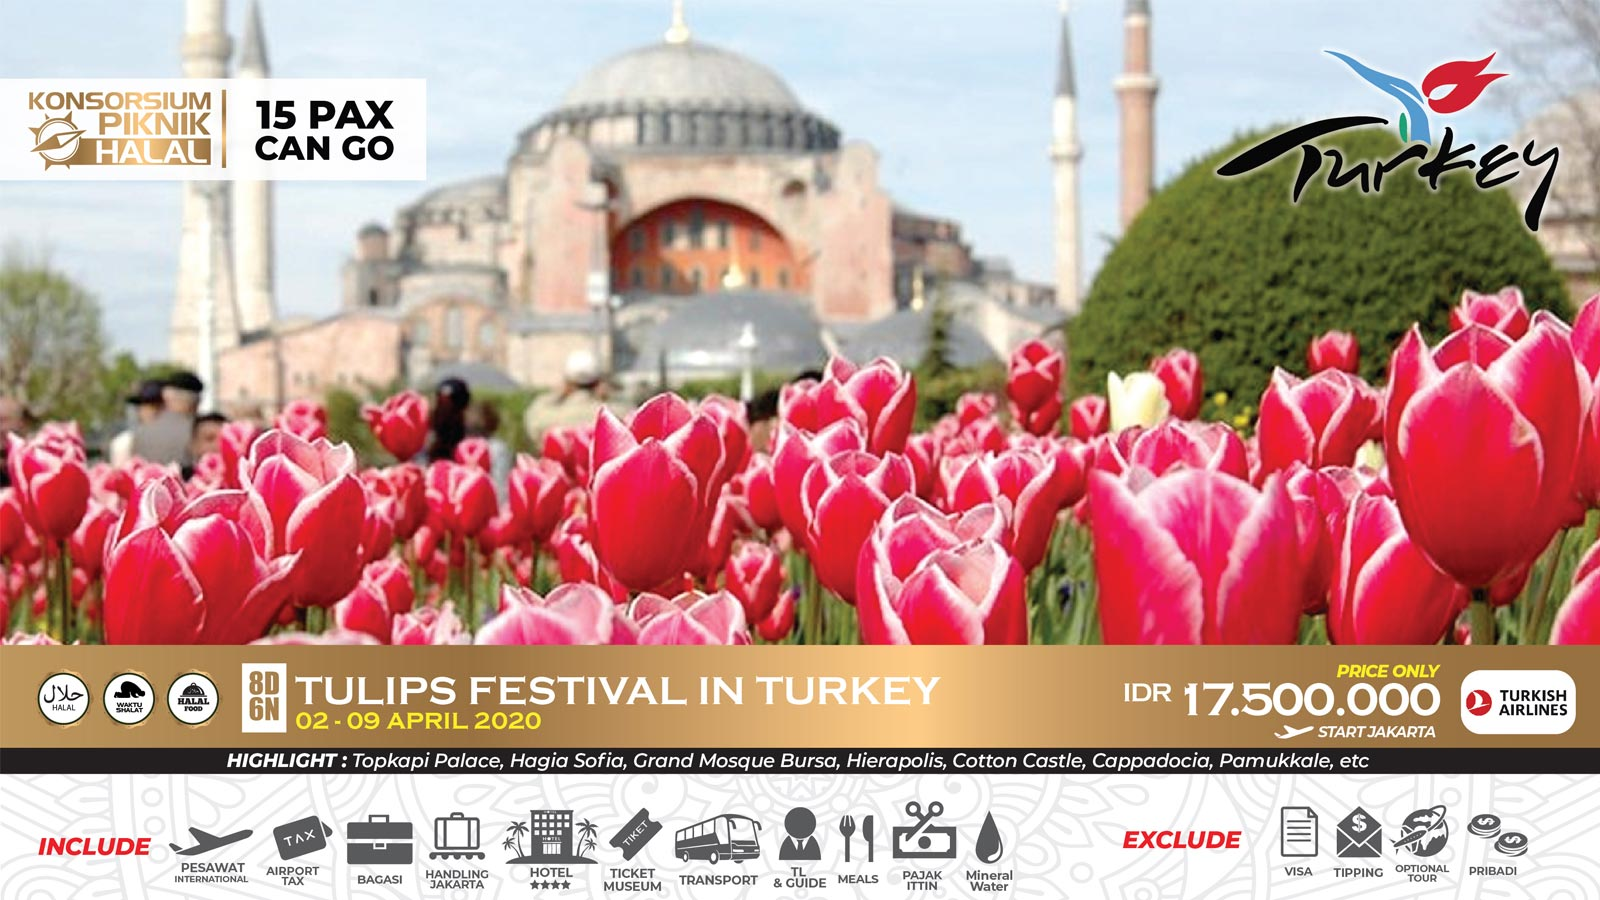 tour turki dari surabaya, tour surabaya turki